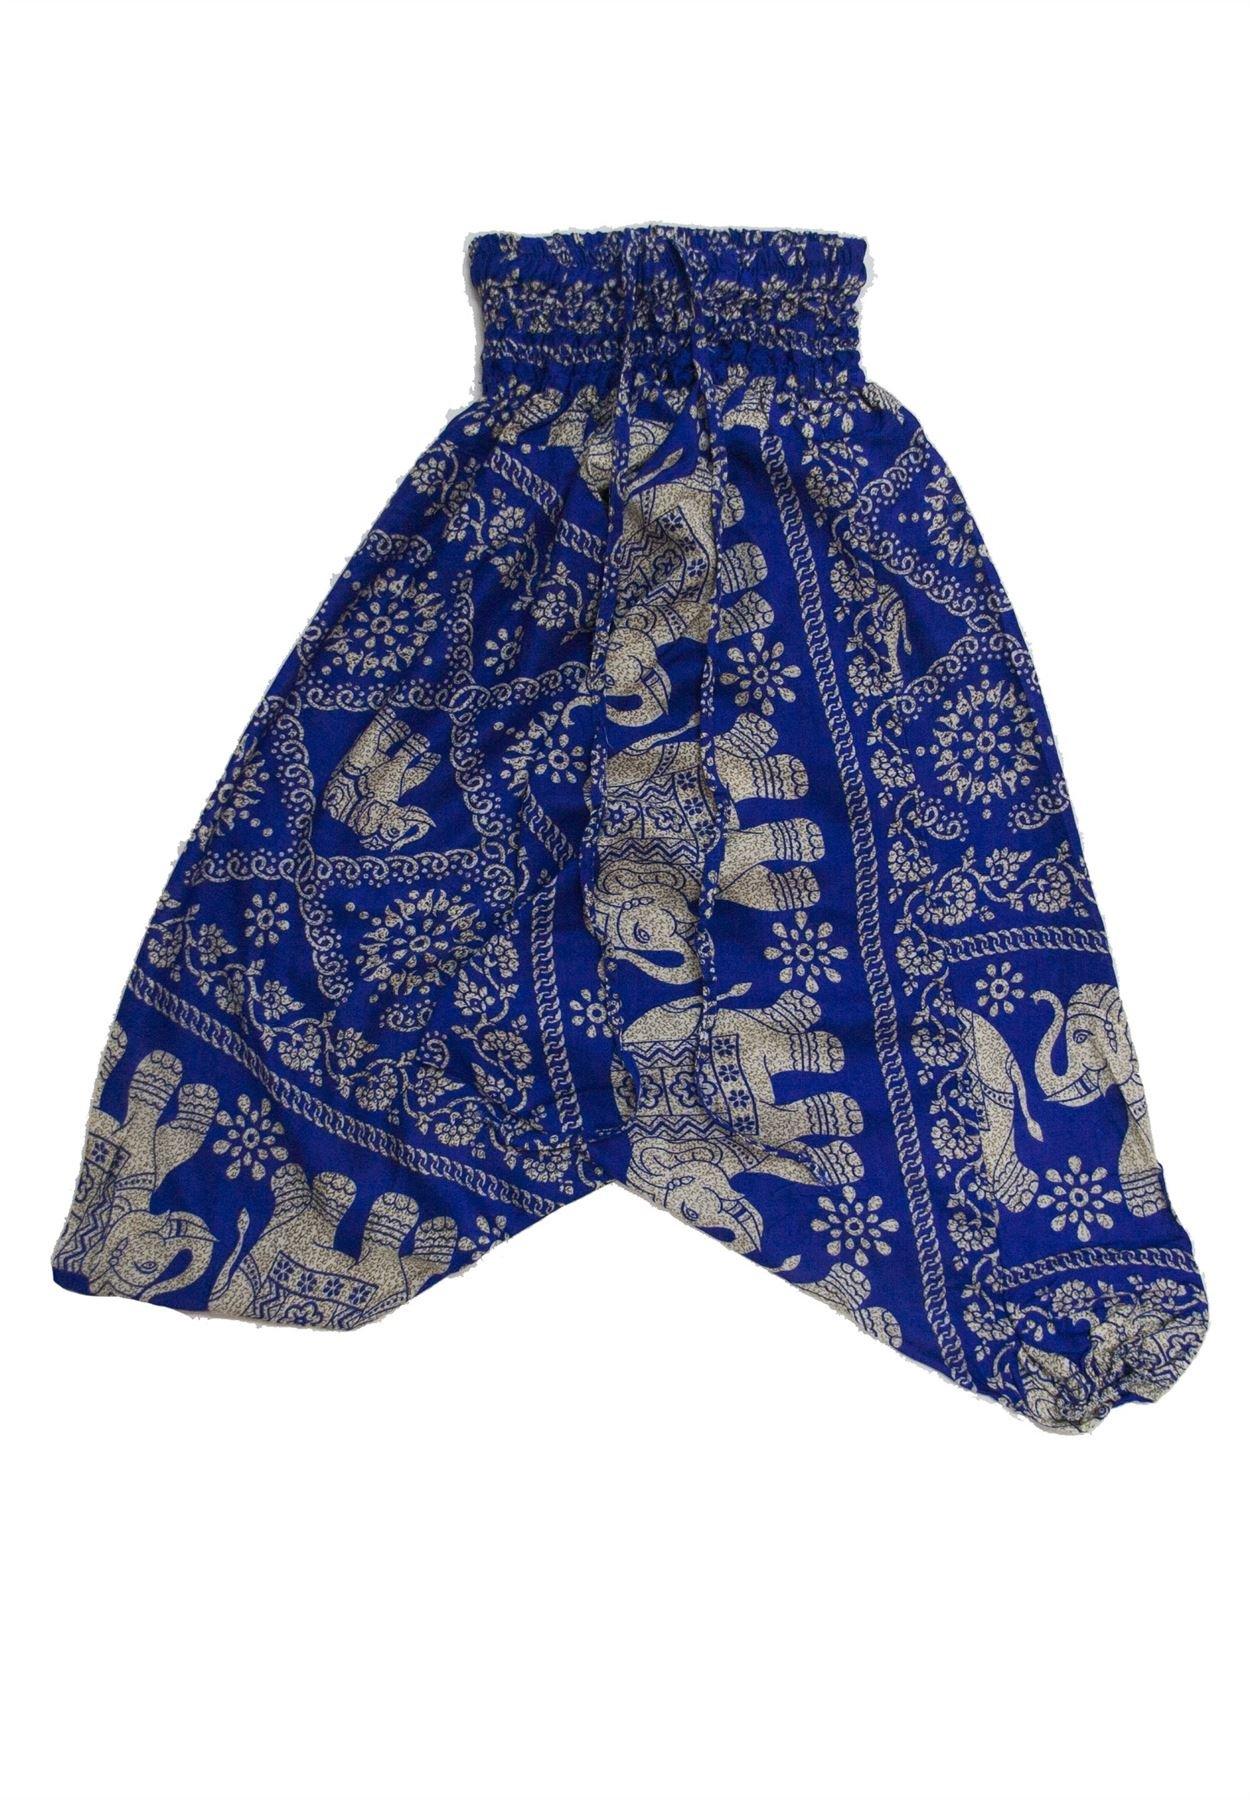 Lofbaz Kids Harem Elephant 2 Child Aladdin Pants Boho Hippy Blue Size 3/4 Years